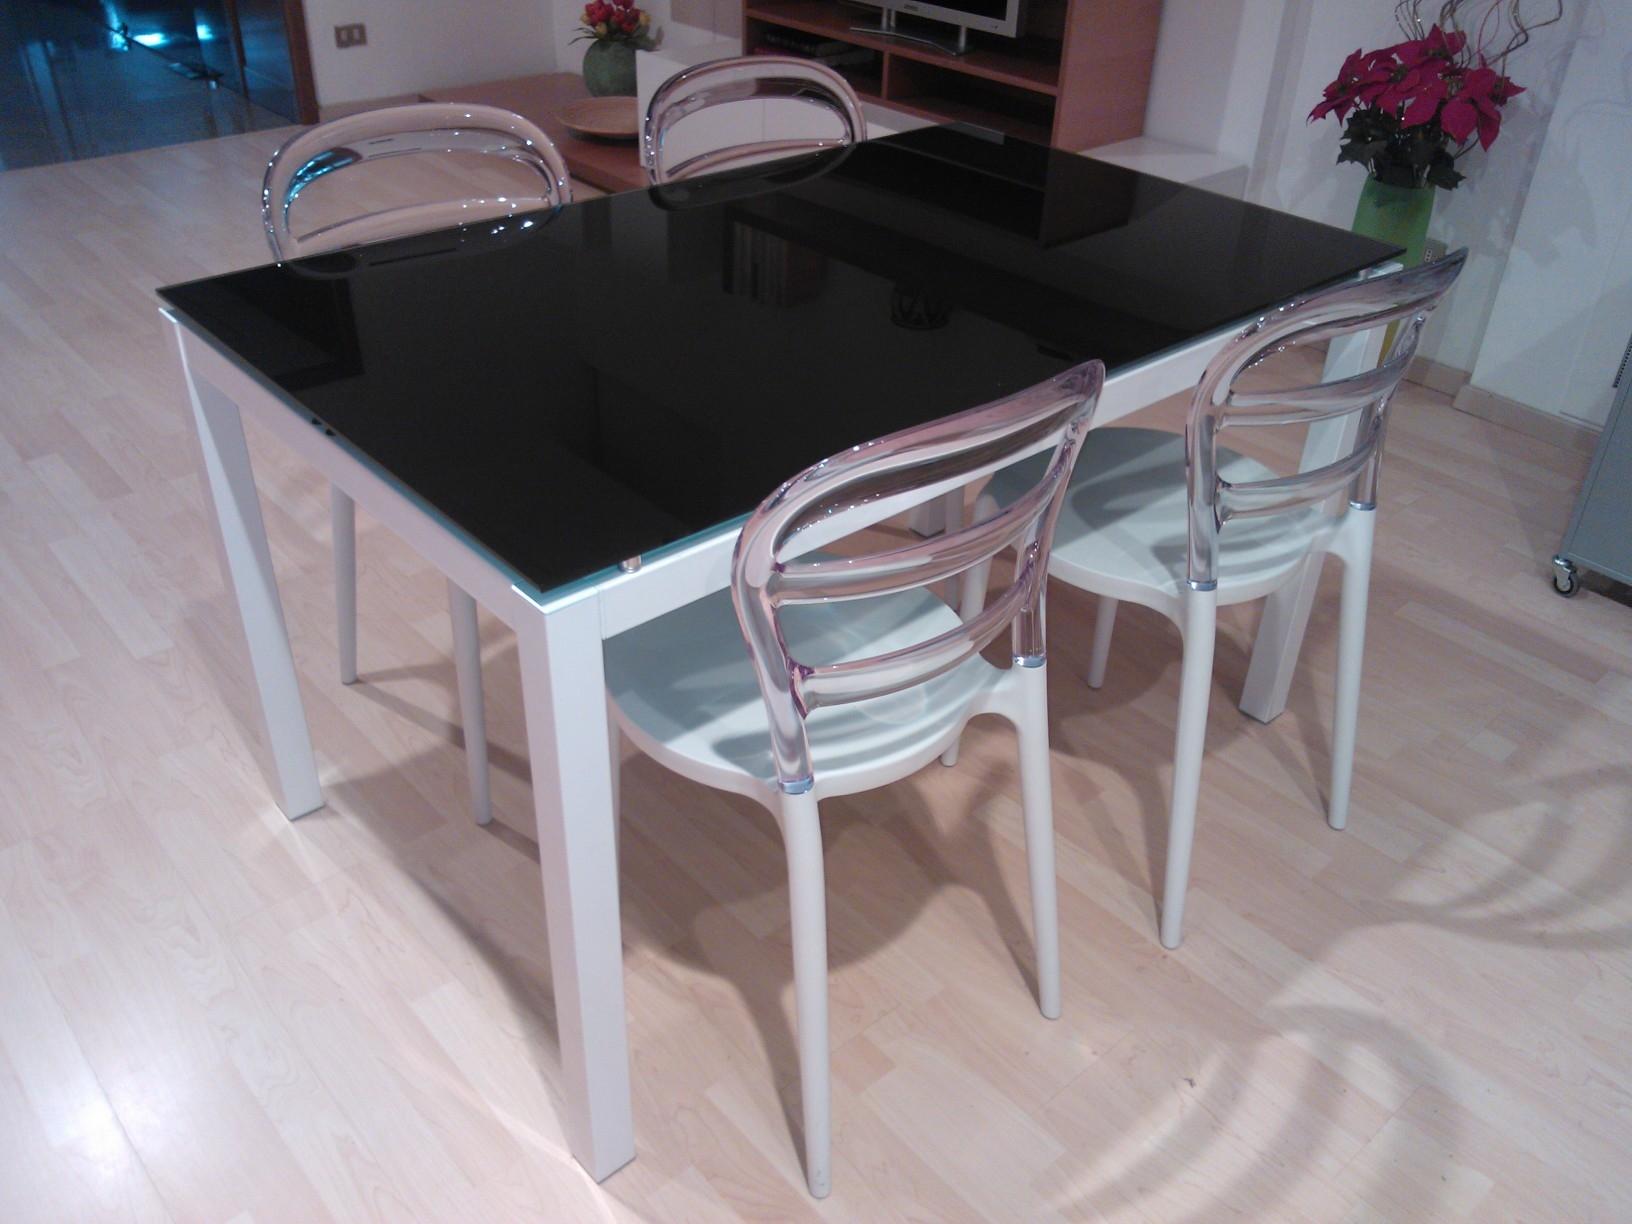 Tavolo la seggiola tavolo cristallo con sedie design in - Tavoli di design in cristallo ...